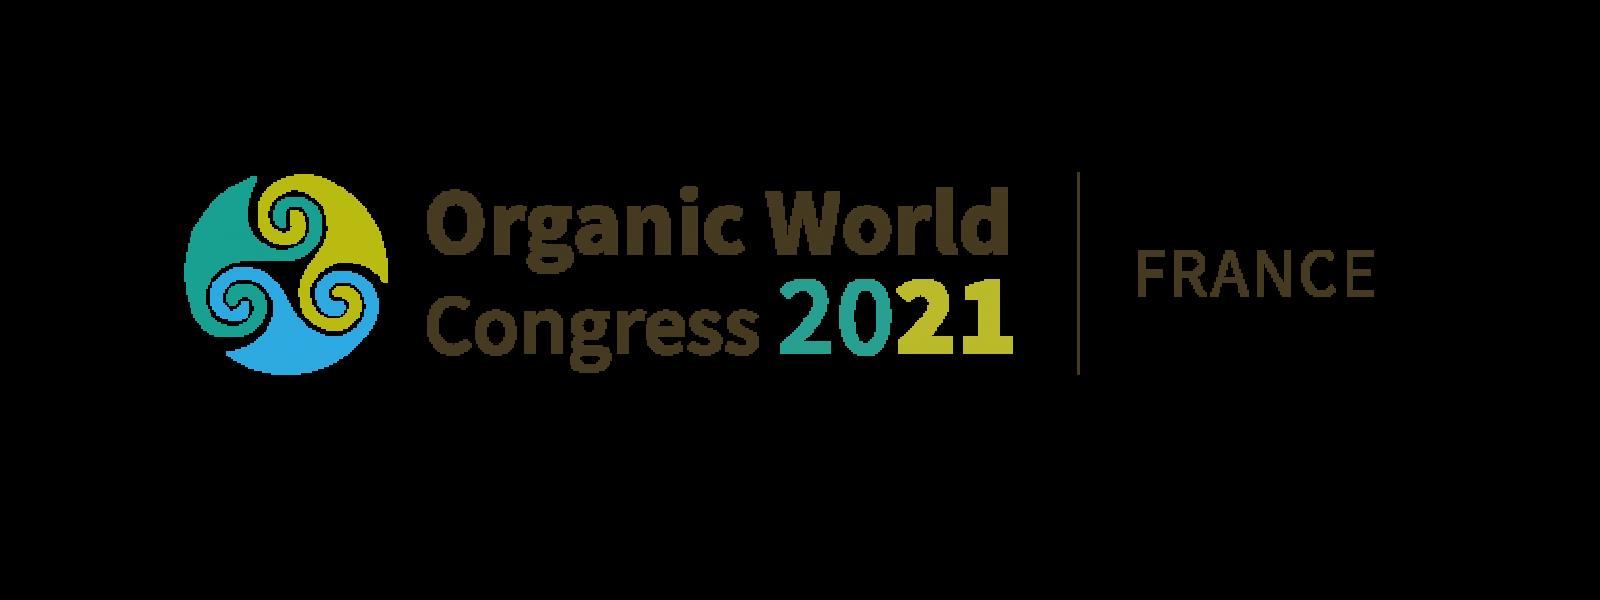 Organic World Congress 2021, Rennes Convention Center